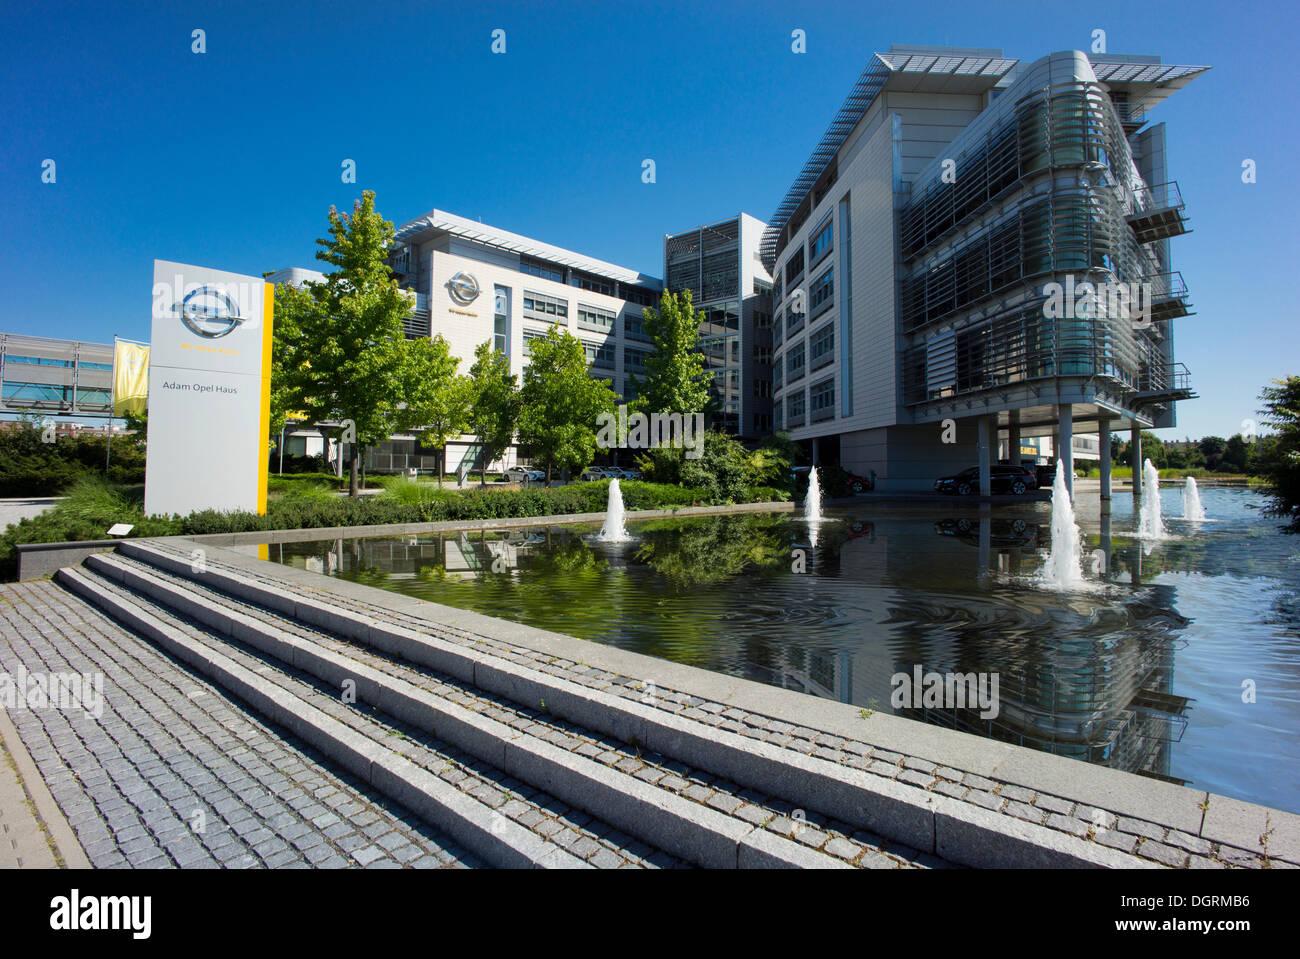 opel building ruesselsheim stockfotos & opel building ruesselsheim